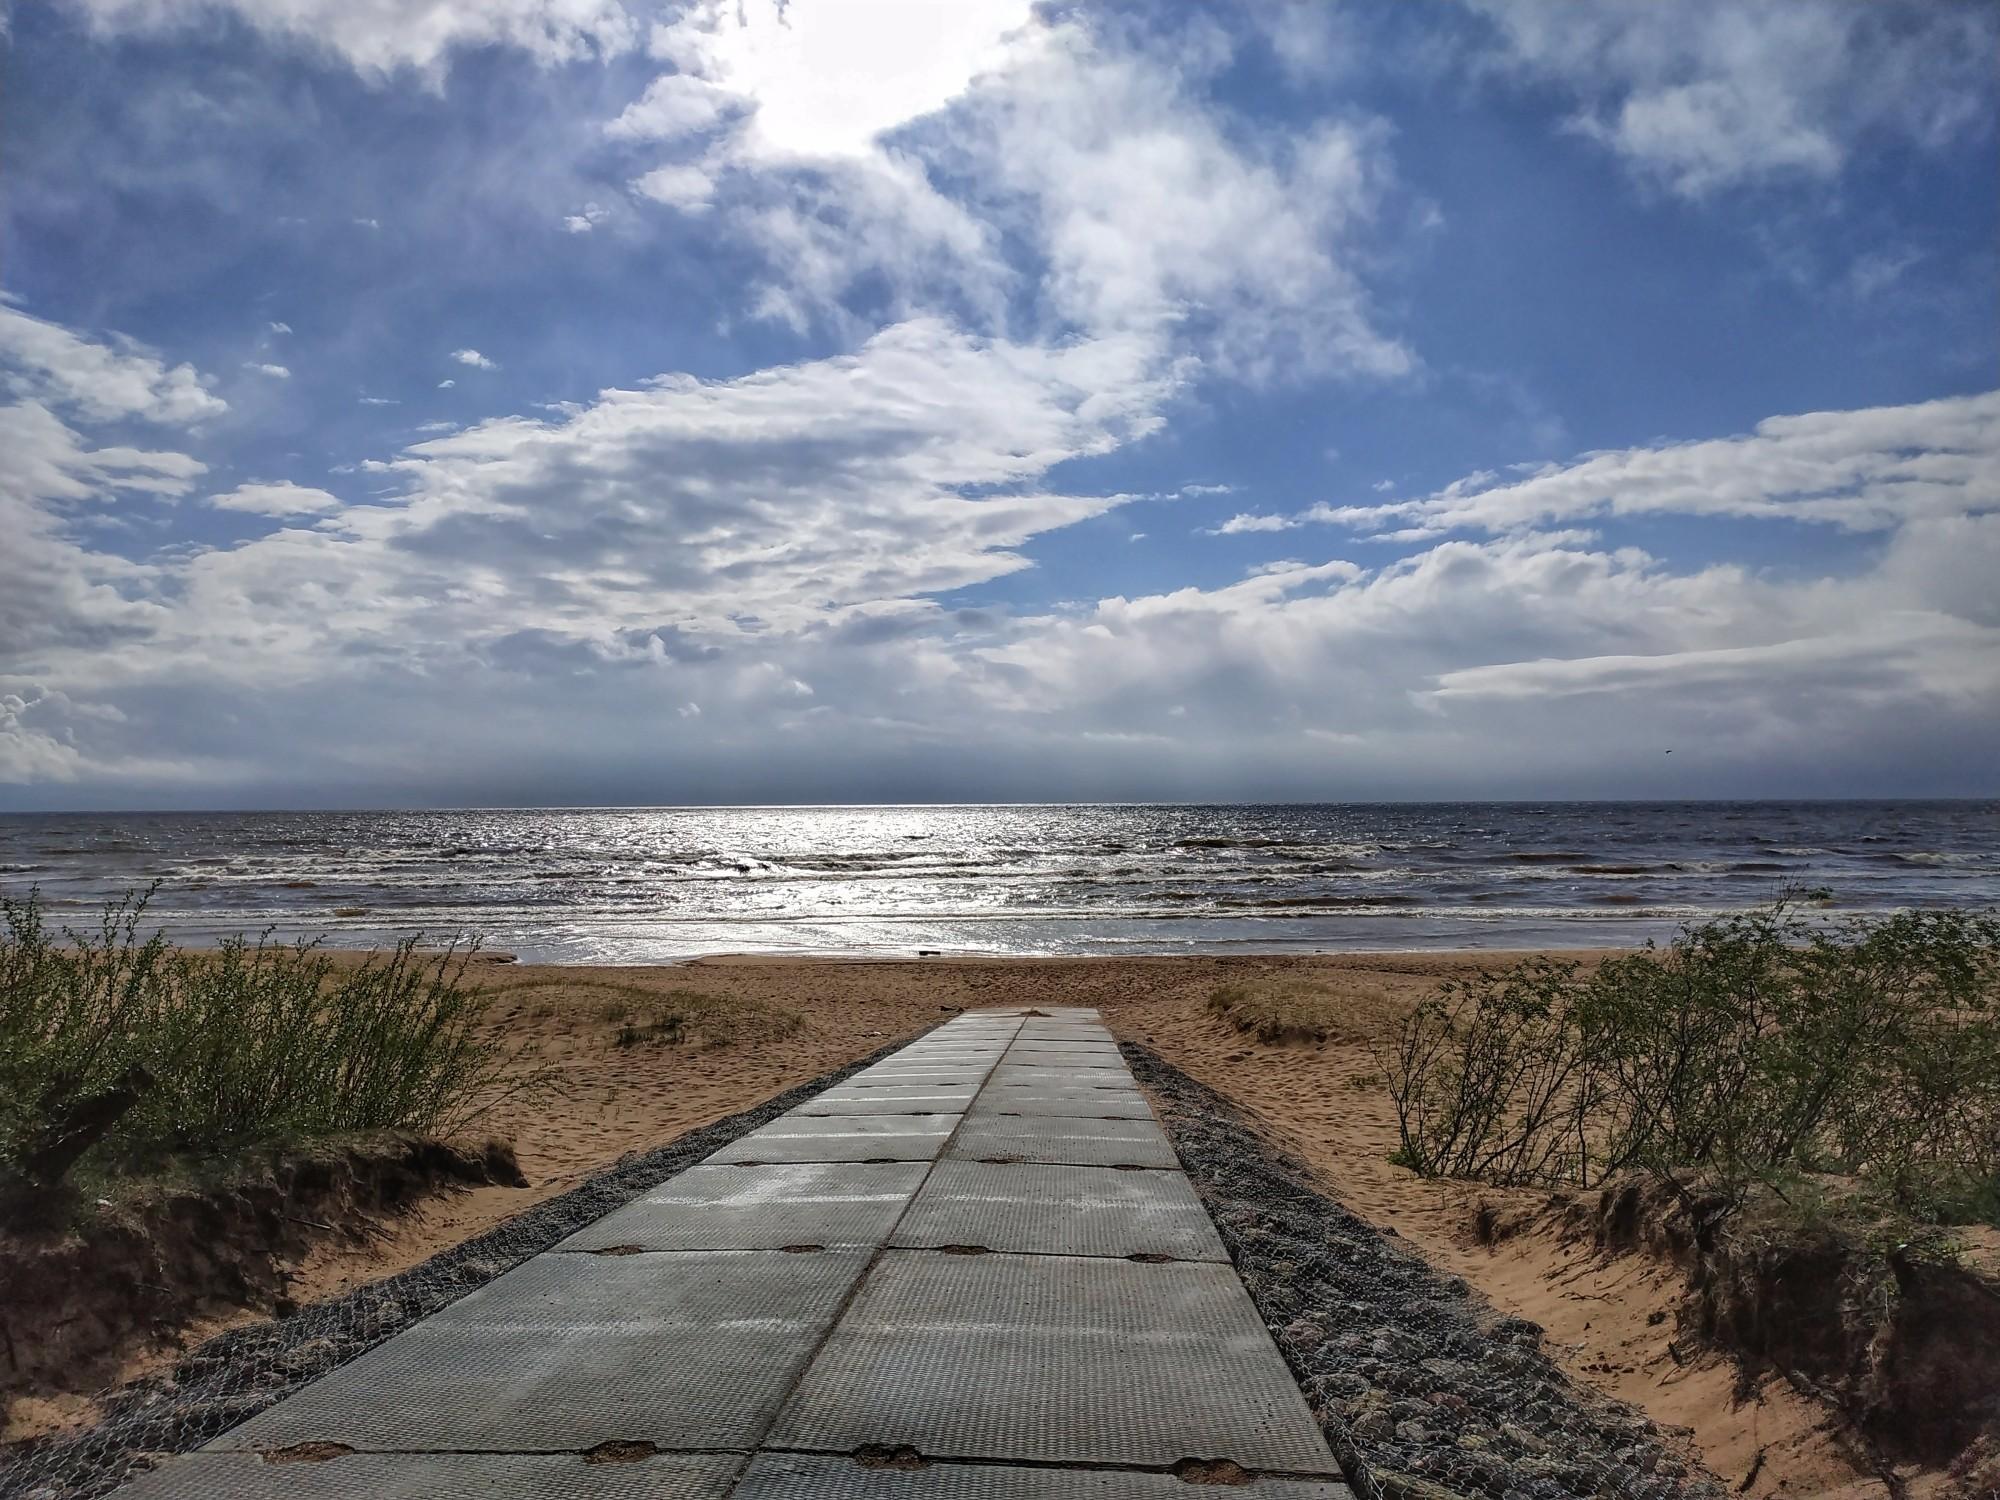 картинки рижского залива австралии всё вверх